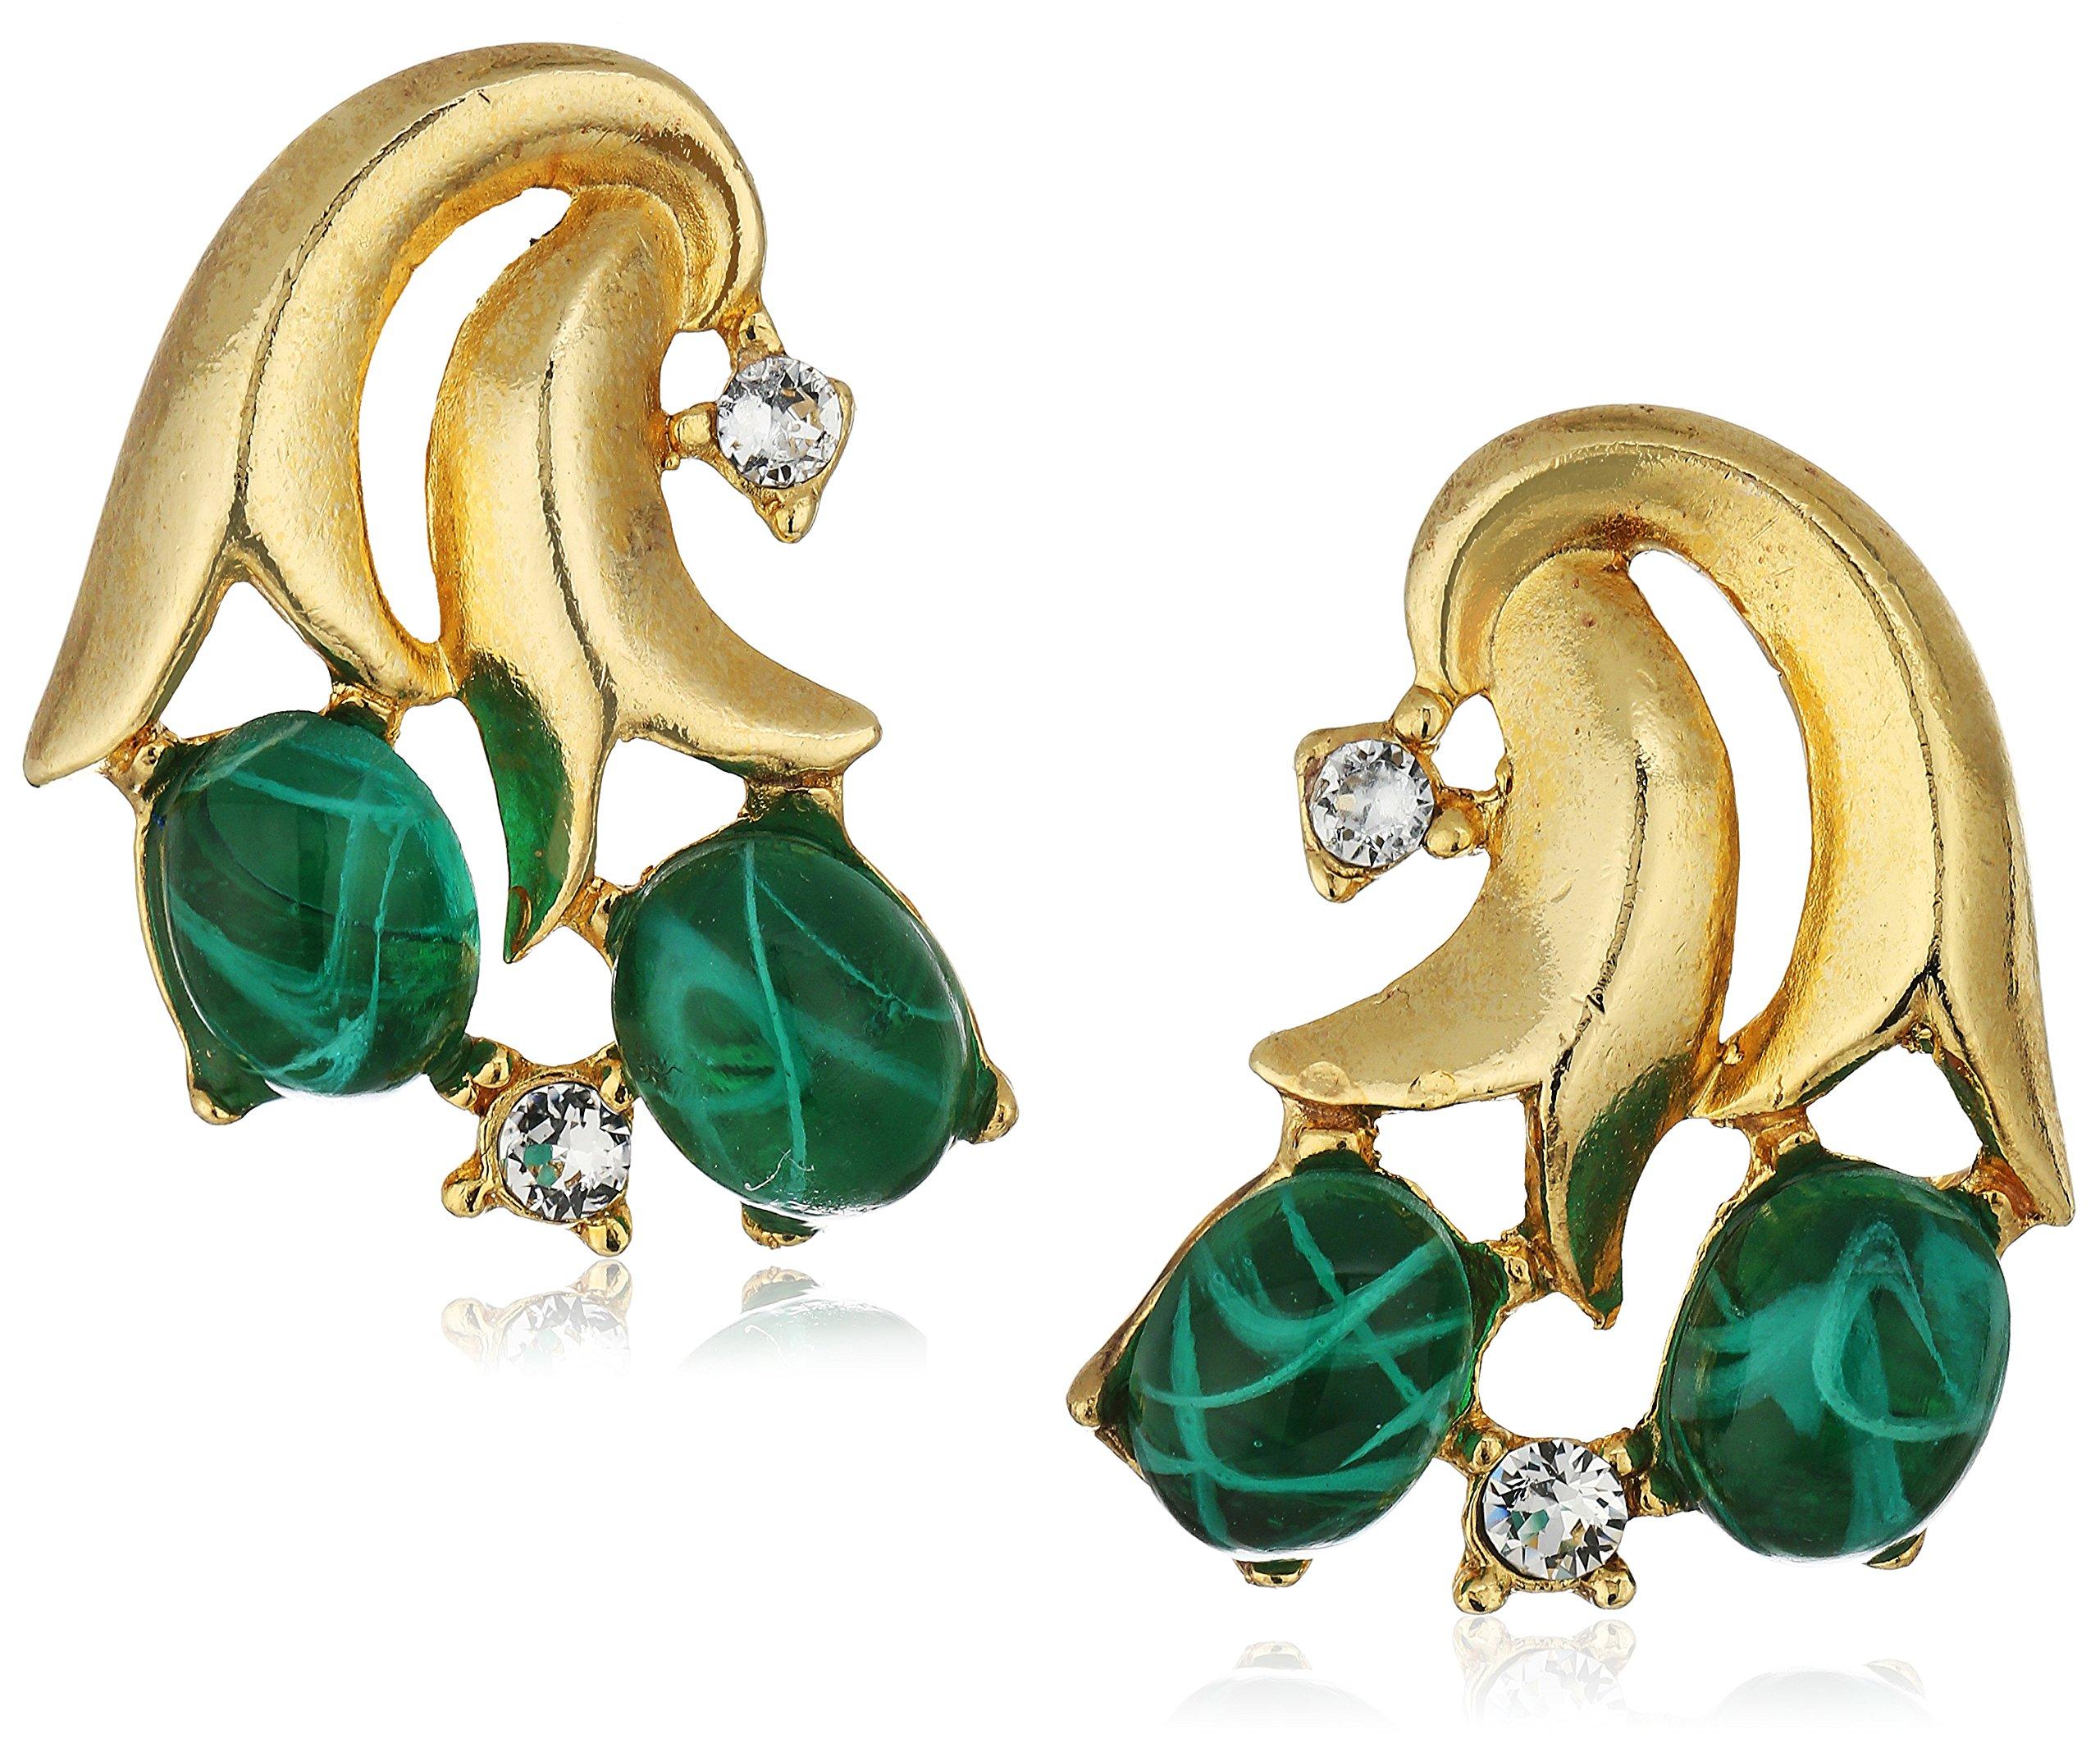 Ben-Amun Jewelry Golden Era Swarovski Crystal Emerald Blossom Drop Earrings for Bridal Wedding Anniversary by Ben-Amun Jewelry